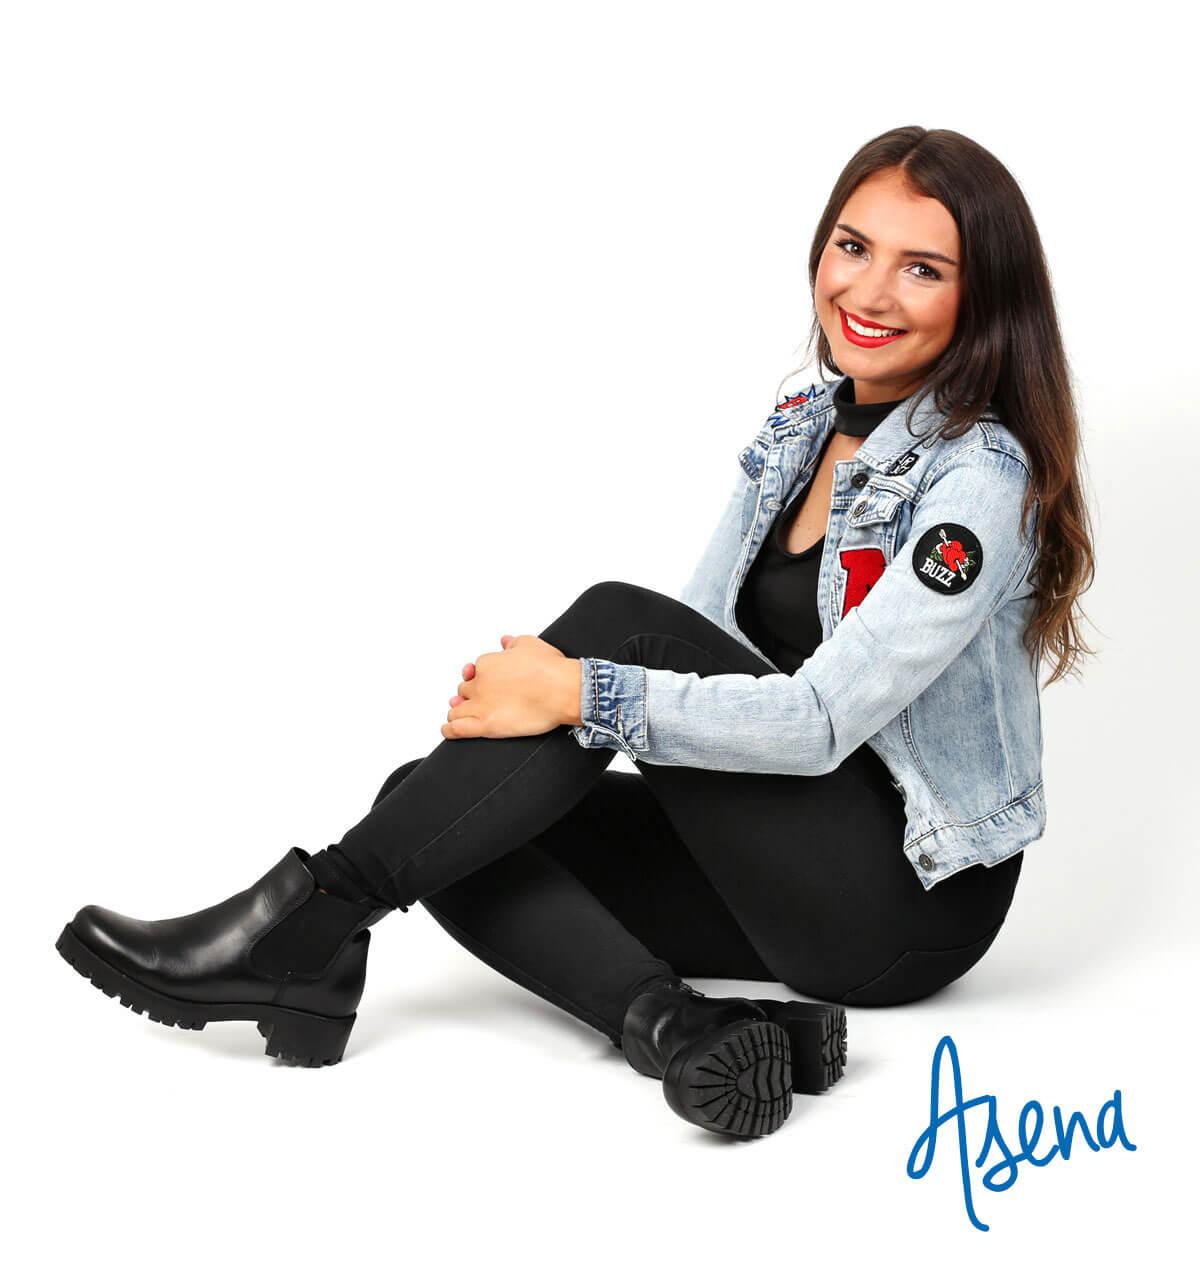 Look Nr. 3: Asena